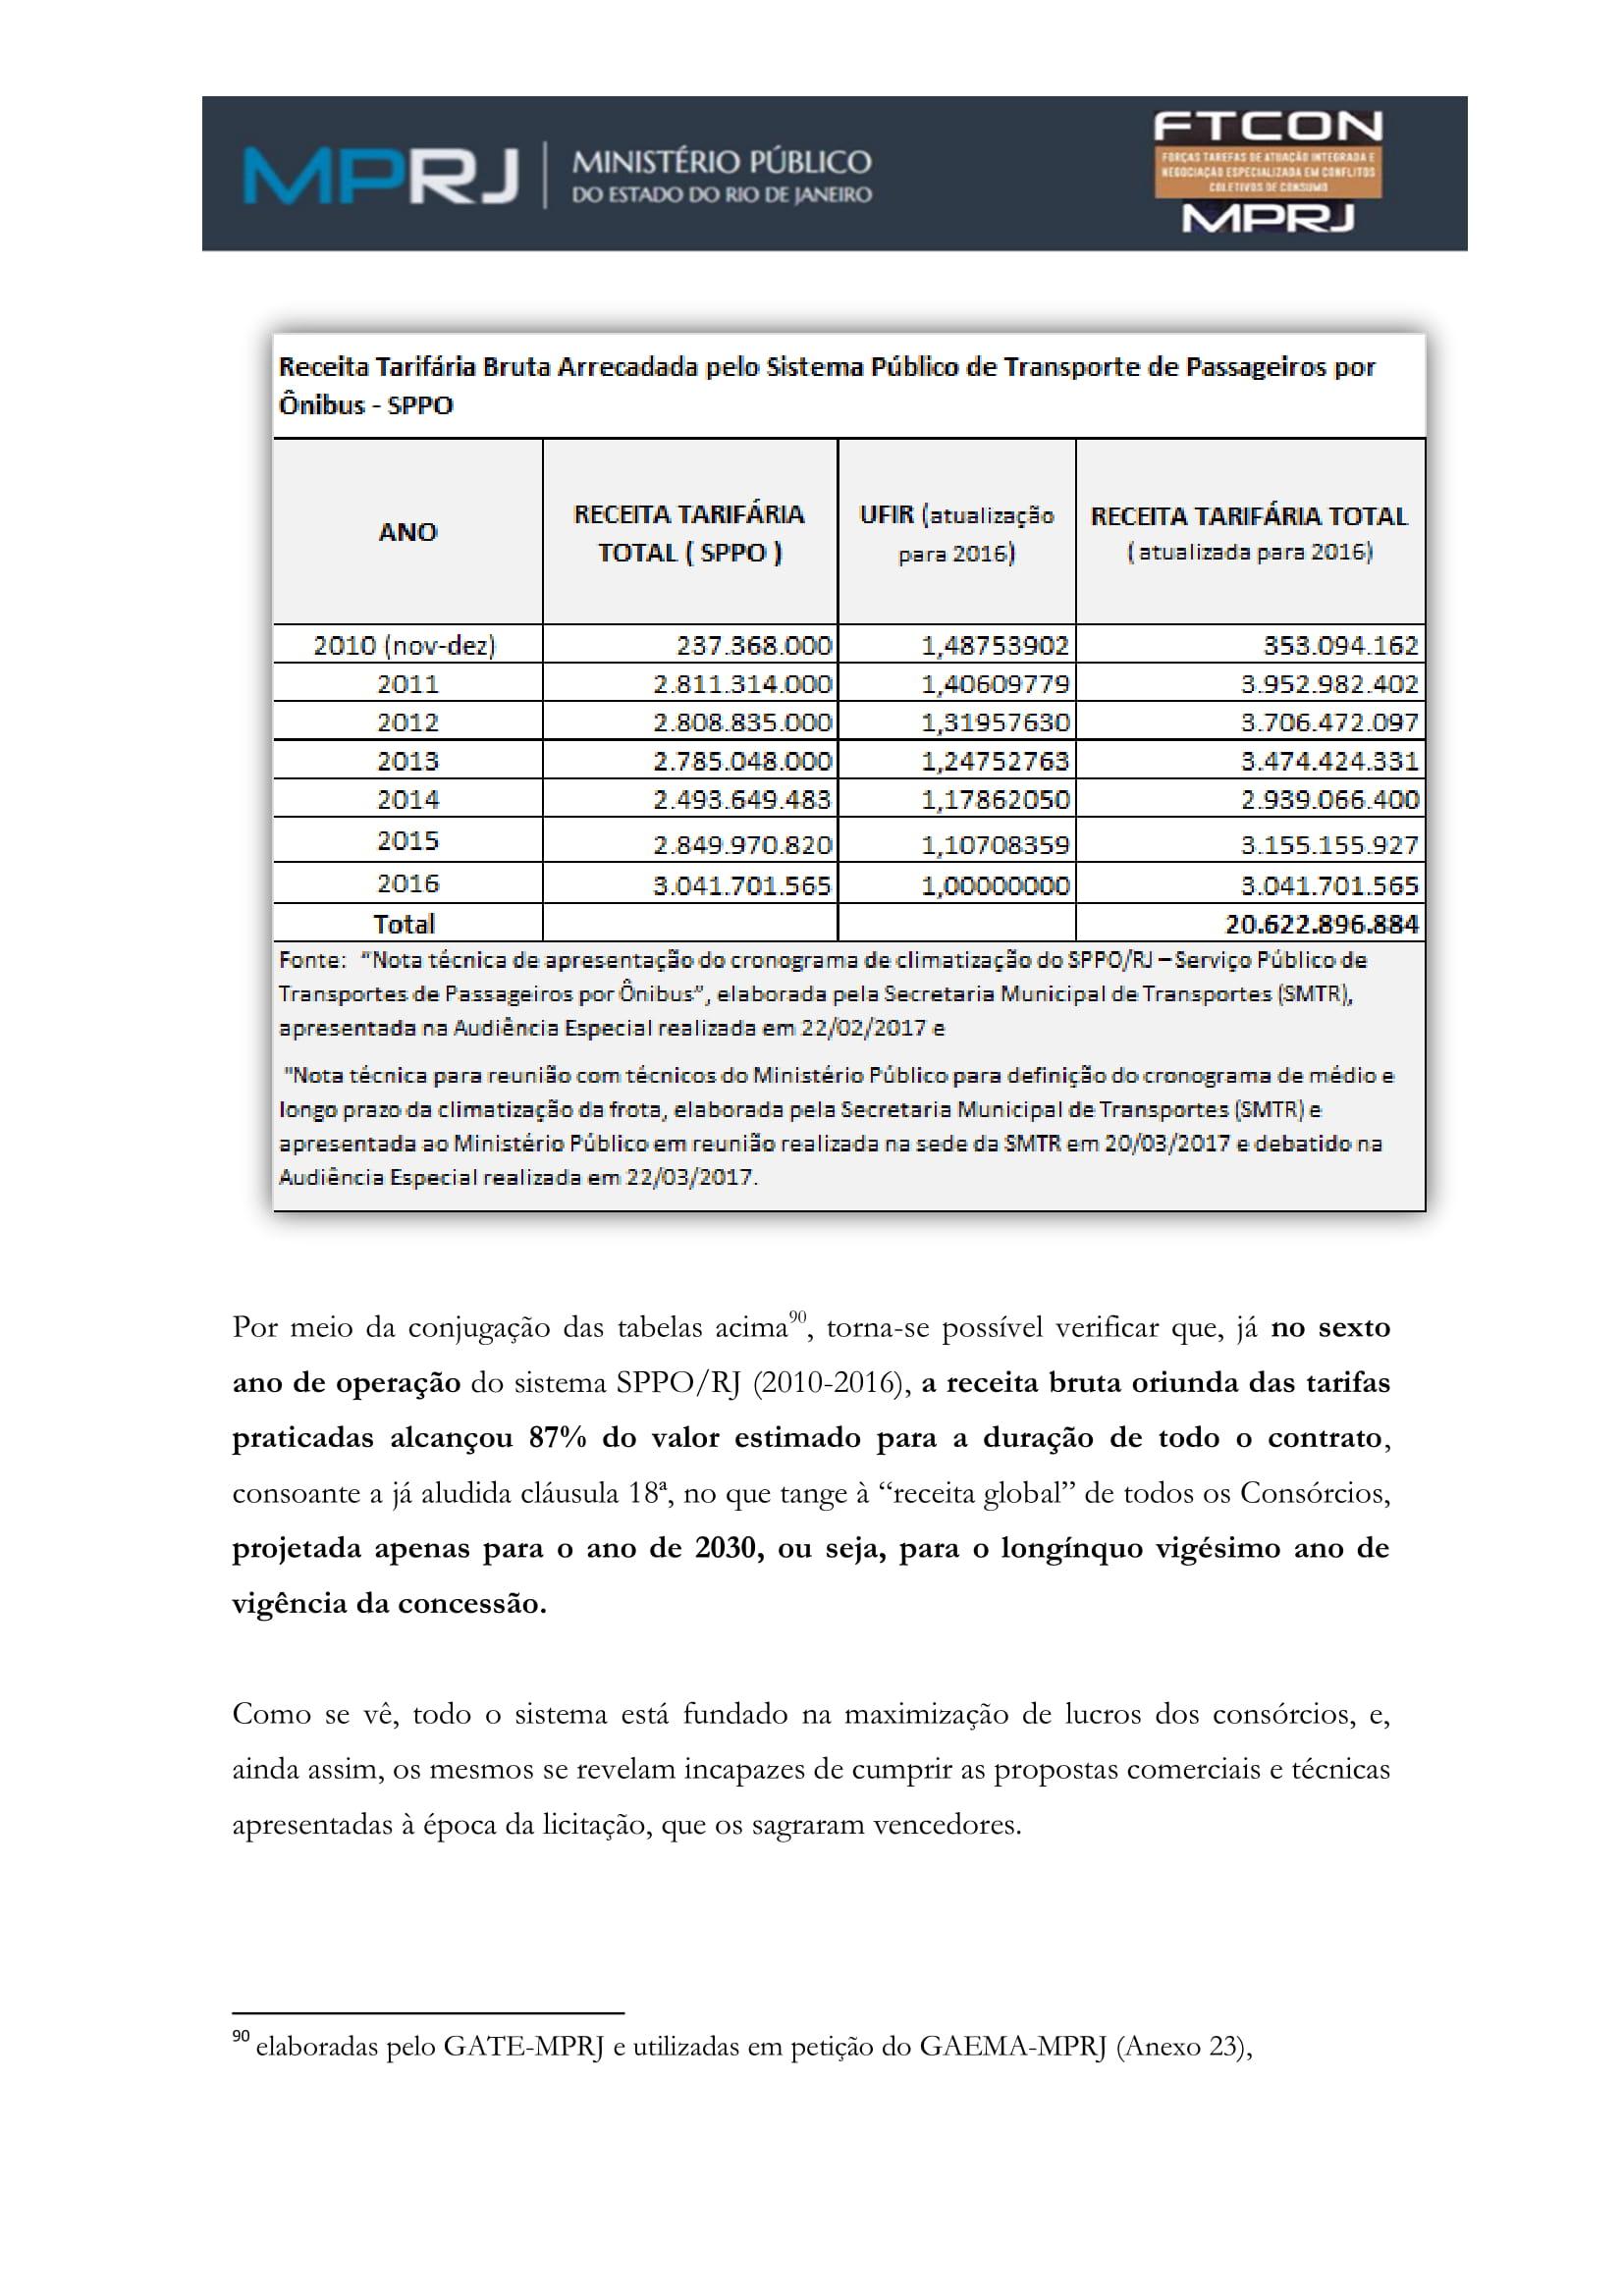 acp_caducidade_onibus_dr_rt-099